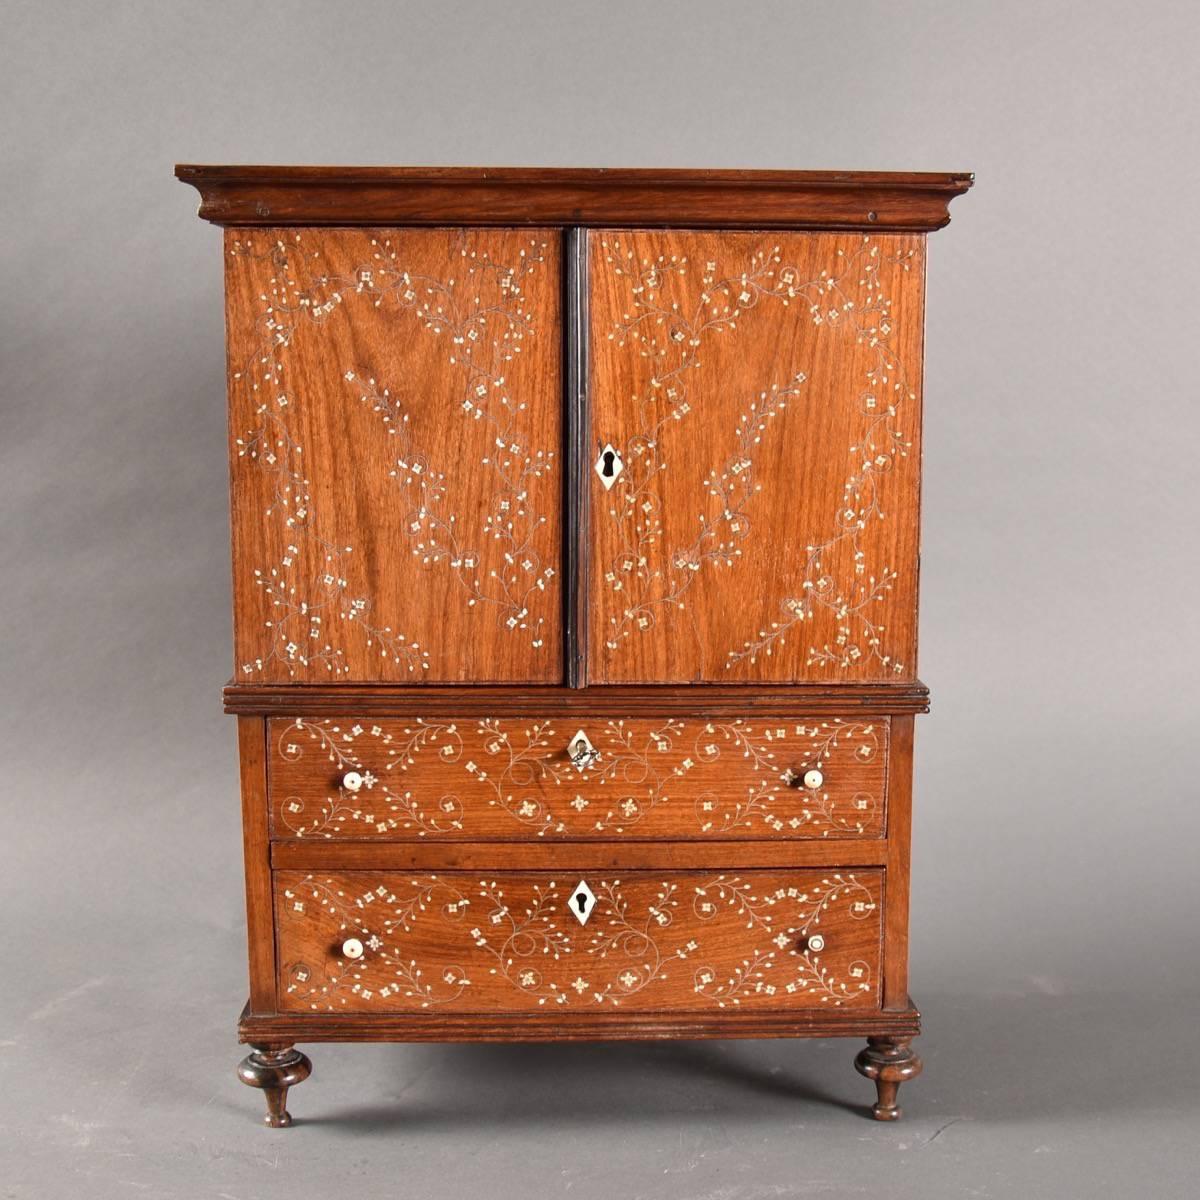 Colonial antique Miniature press cupboard | De Grande Antique Furniture - Miniature Press Cupboard De Grande Antique Furniture